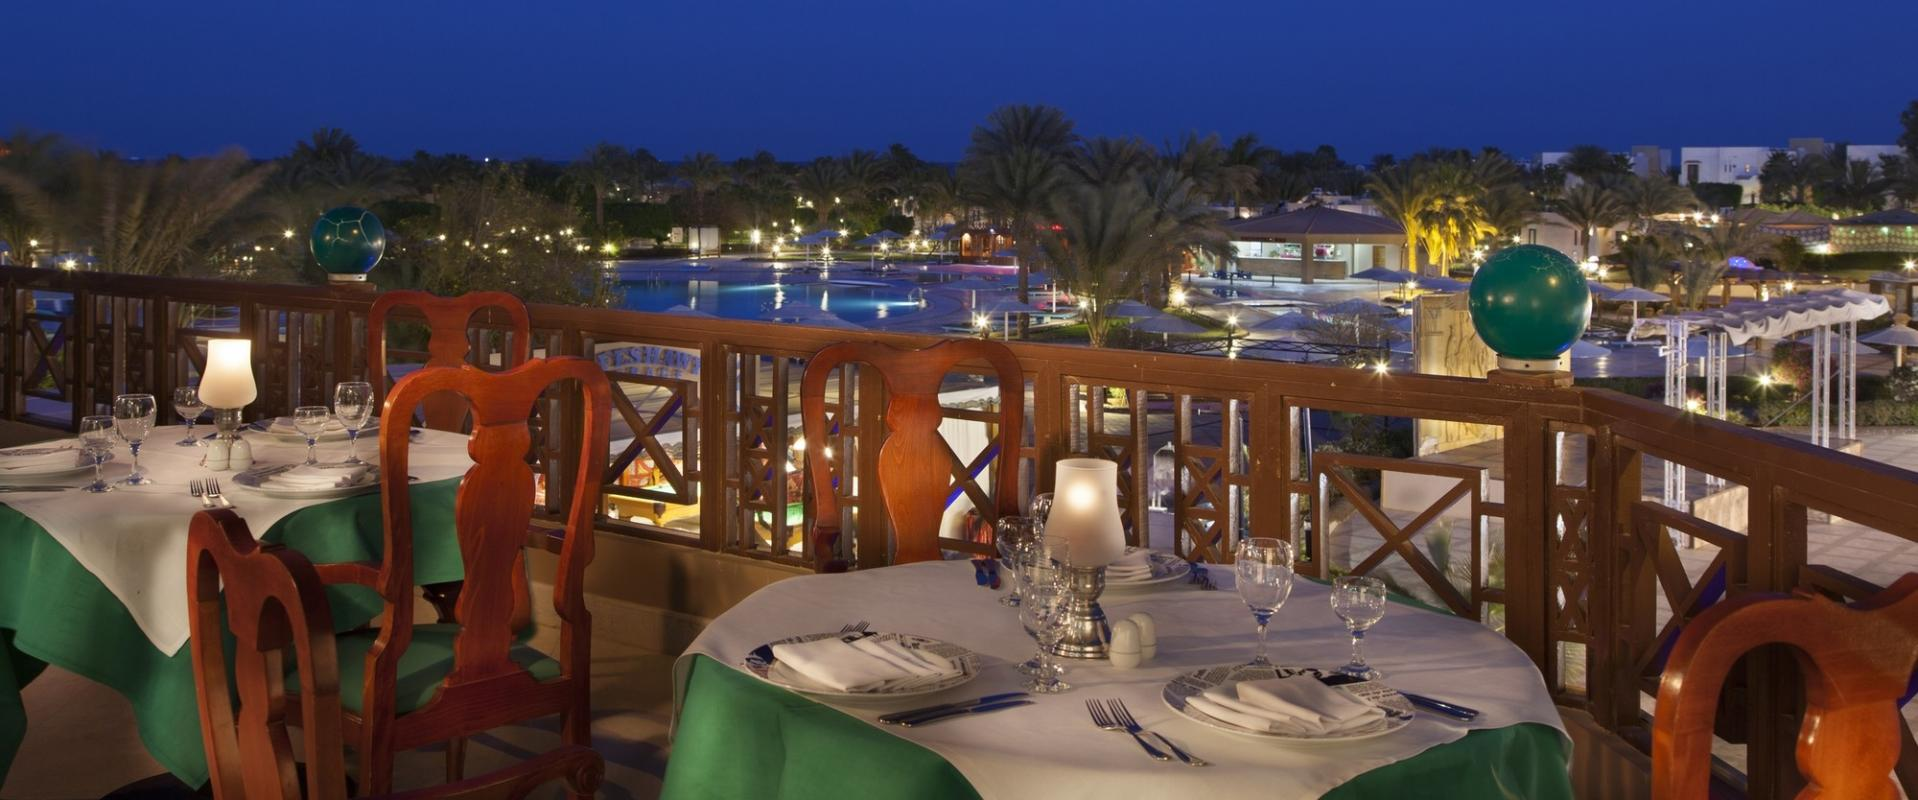 http://egypte.croisiere.voyage/wp-content/uploads/2016/11/HRG-SH-Hurghada-Valentinos-Italian-Restaurant.jpg